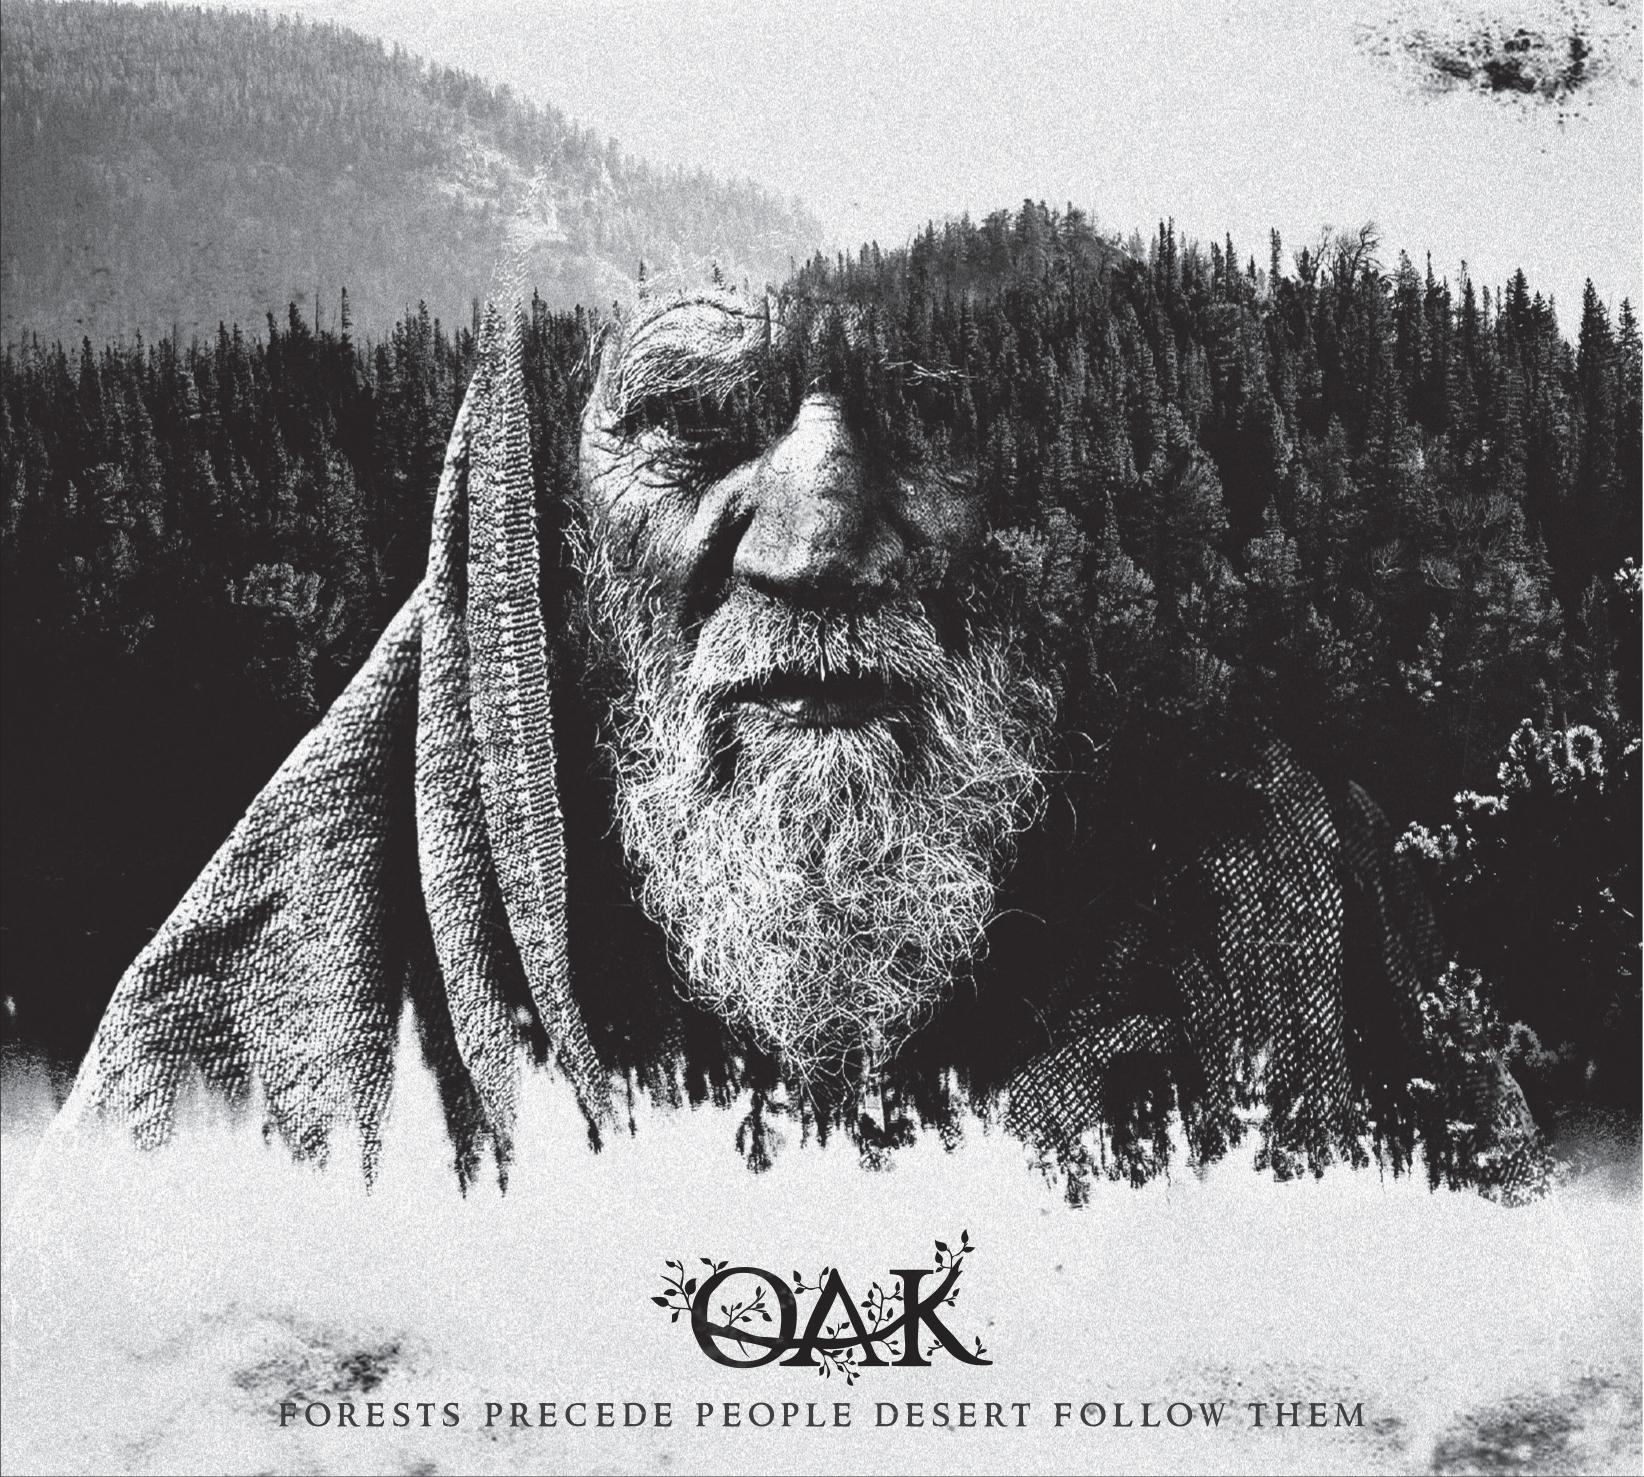 Oak - Forests Precede People Desert Follow Them - Album Cover